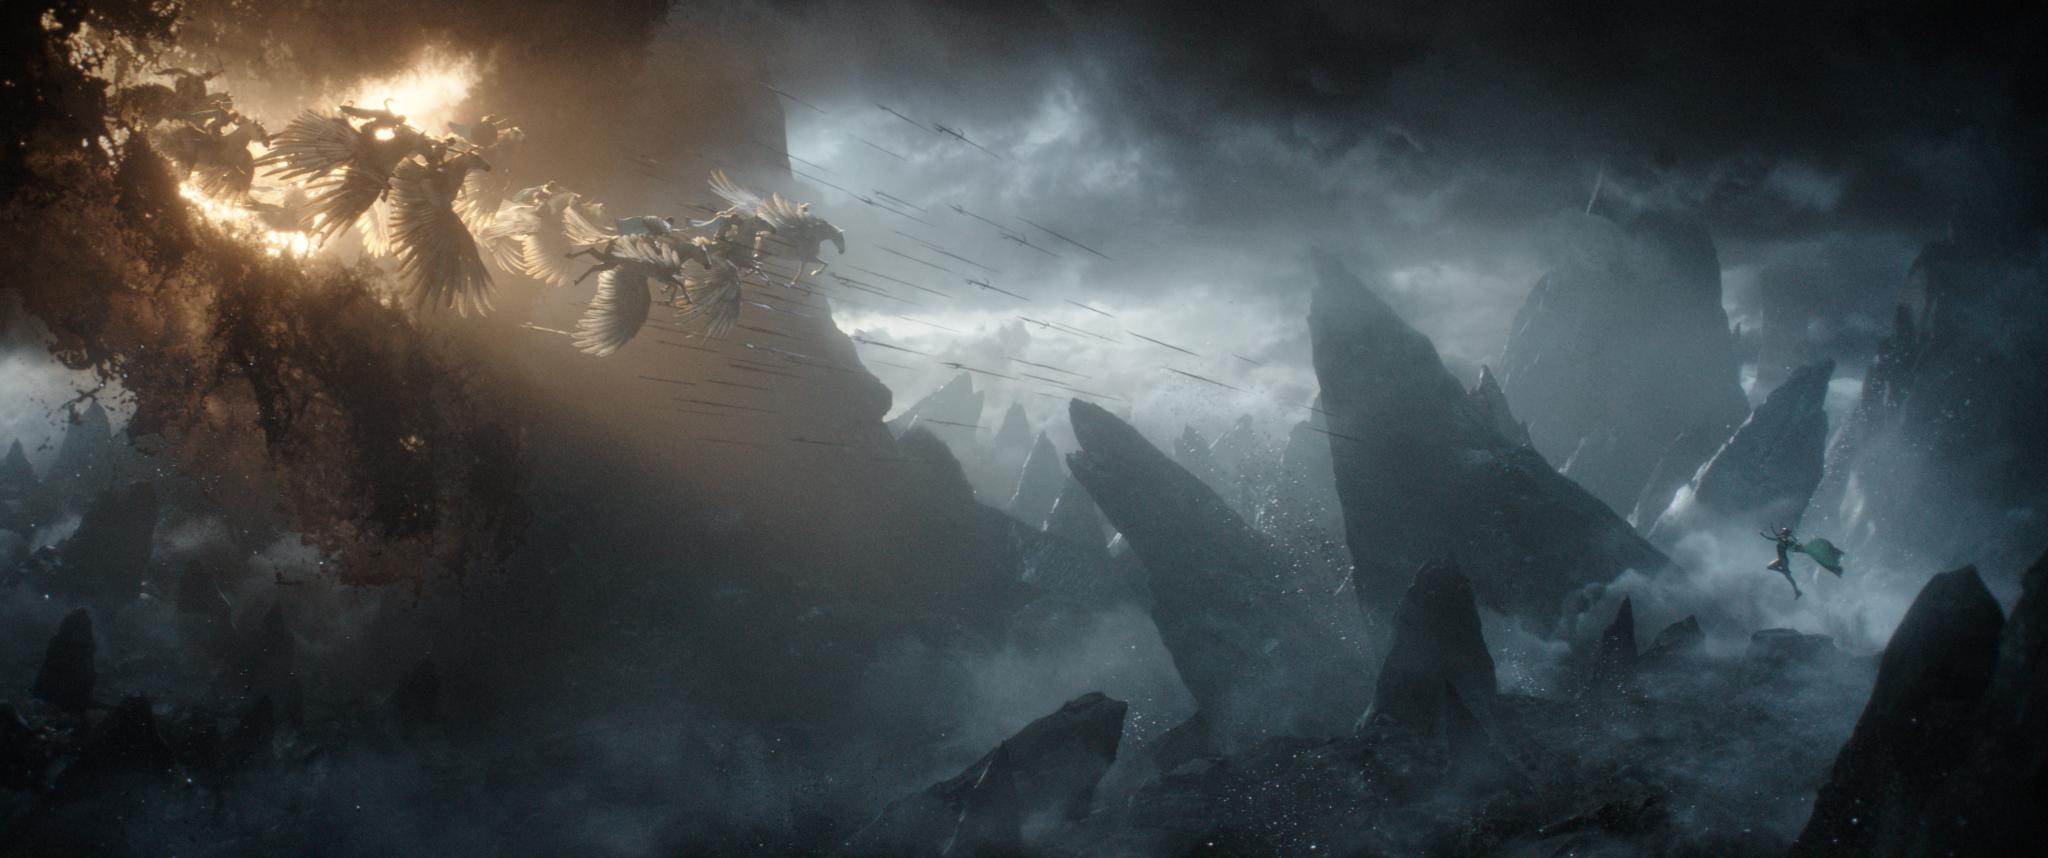 Wonderful Wallpaper Marvel Valkyrie - Thor-Ragnarok-valkyries-Pegasus-sword-women-outdoors-movies-1181546  Perfect Image Reference_918485.jpg